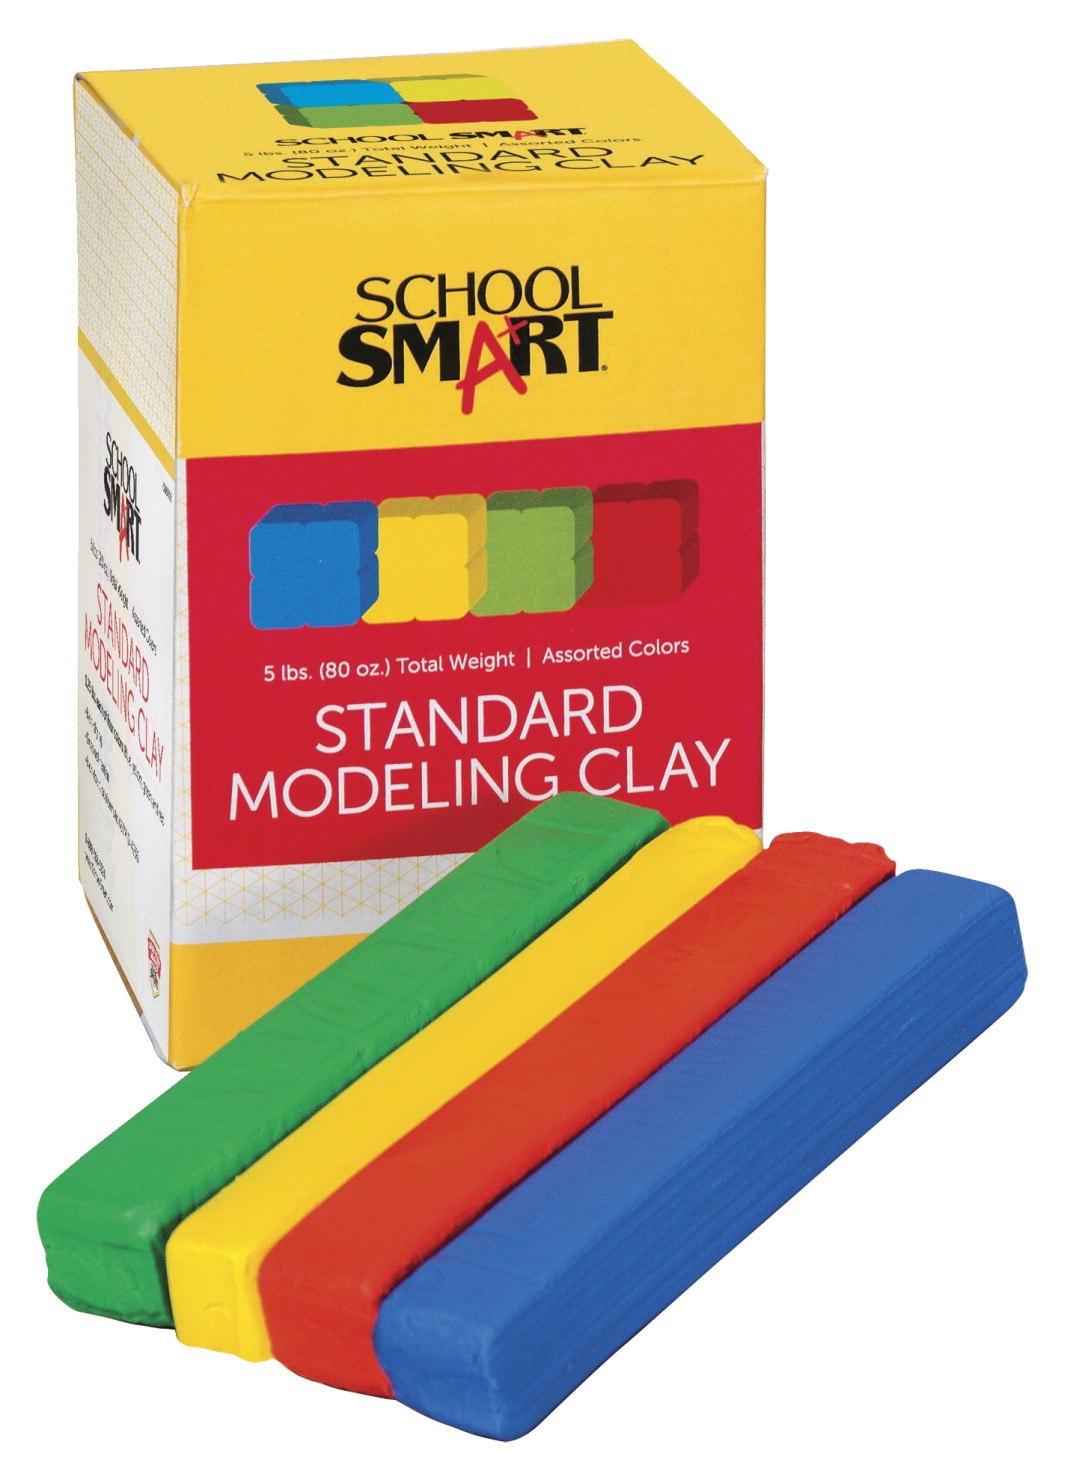 School Smart Non-Toxic Modeling Clay Set, 5 lb, Assorted Standard Colors by Dixon Ticonderoga Co